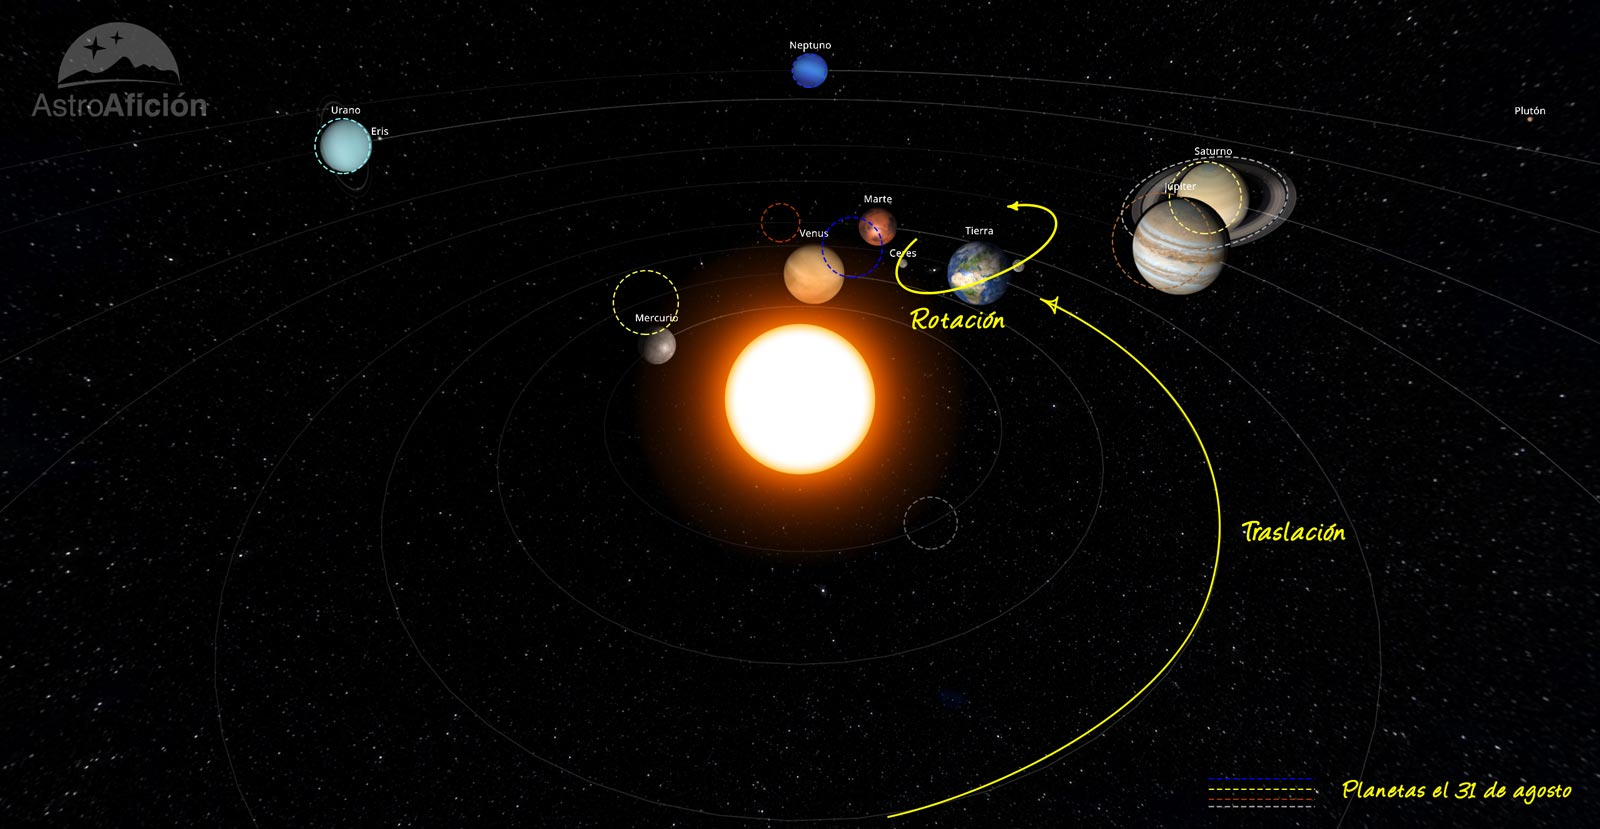 Efemérides astronómicas: Agosto de 2020